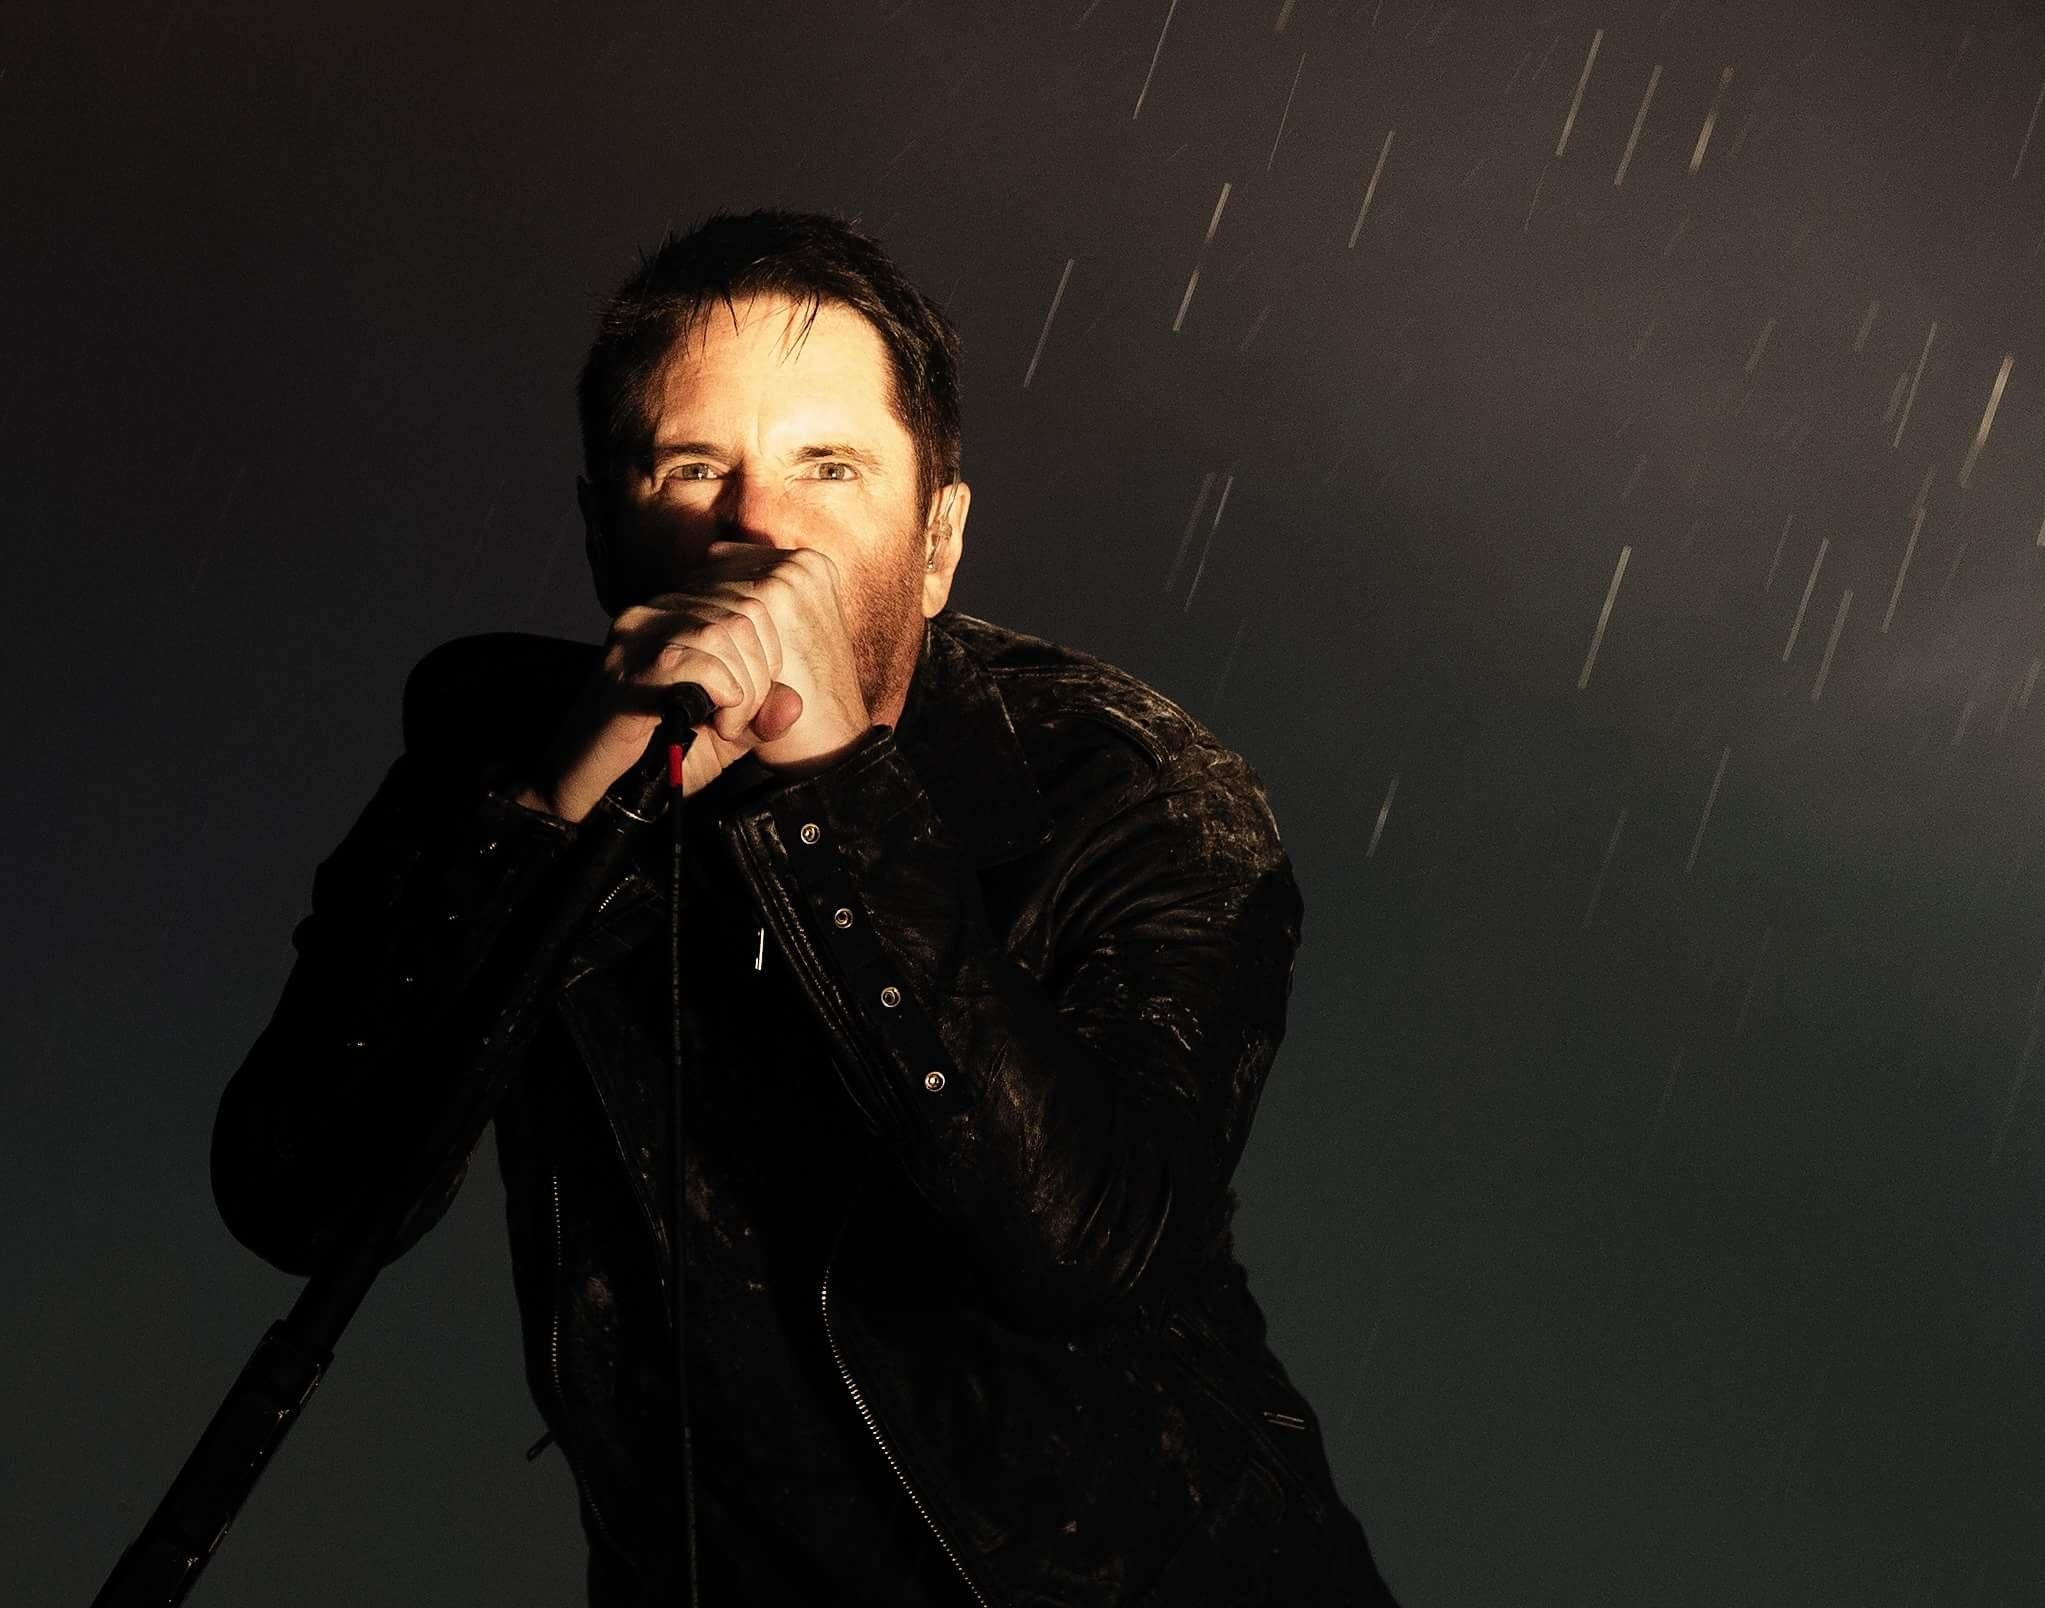 Nine Inch Nails Lyrics, Music, News and Biography | MetroLyrics